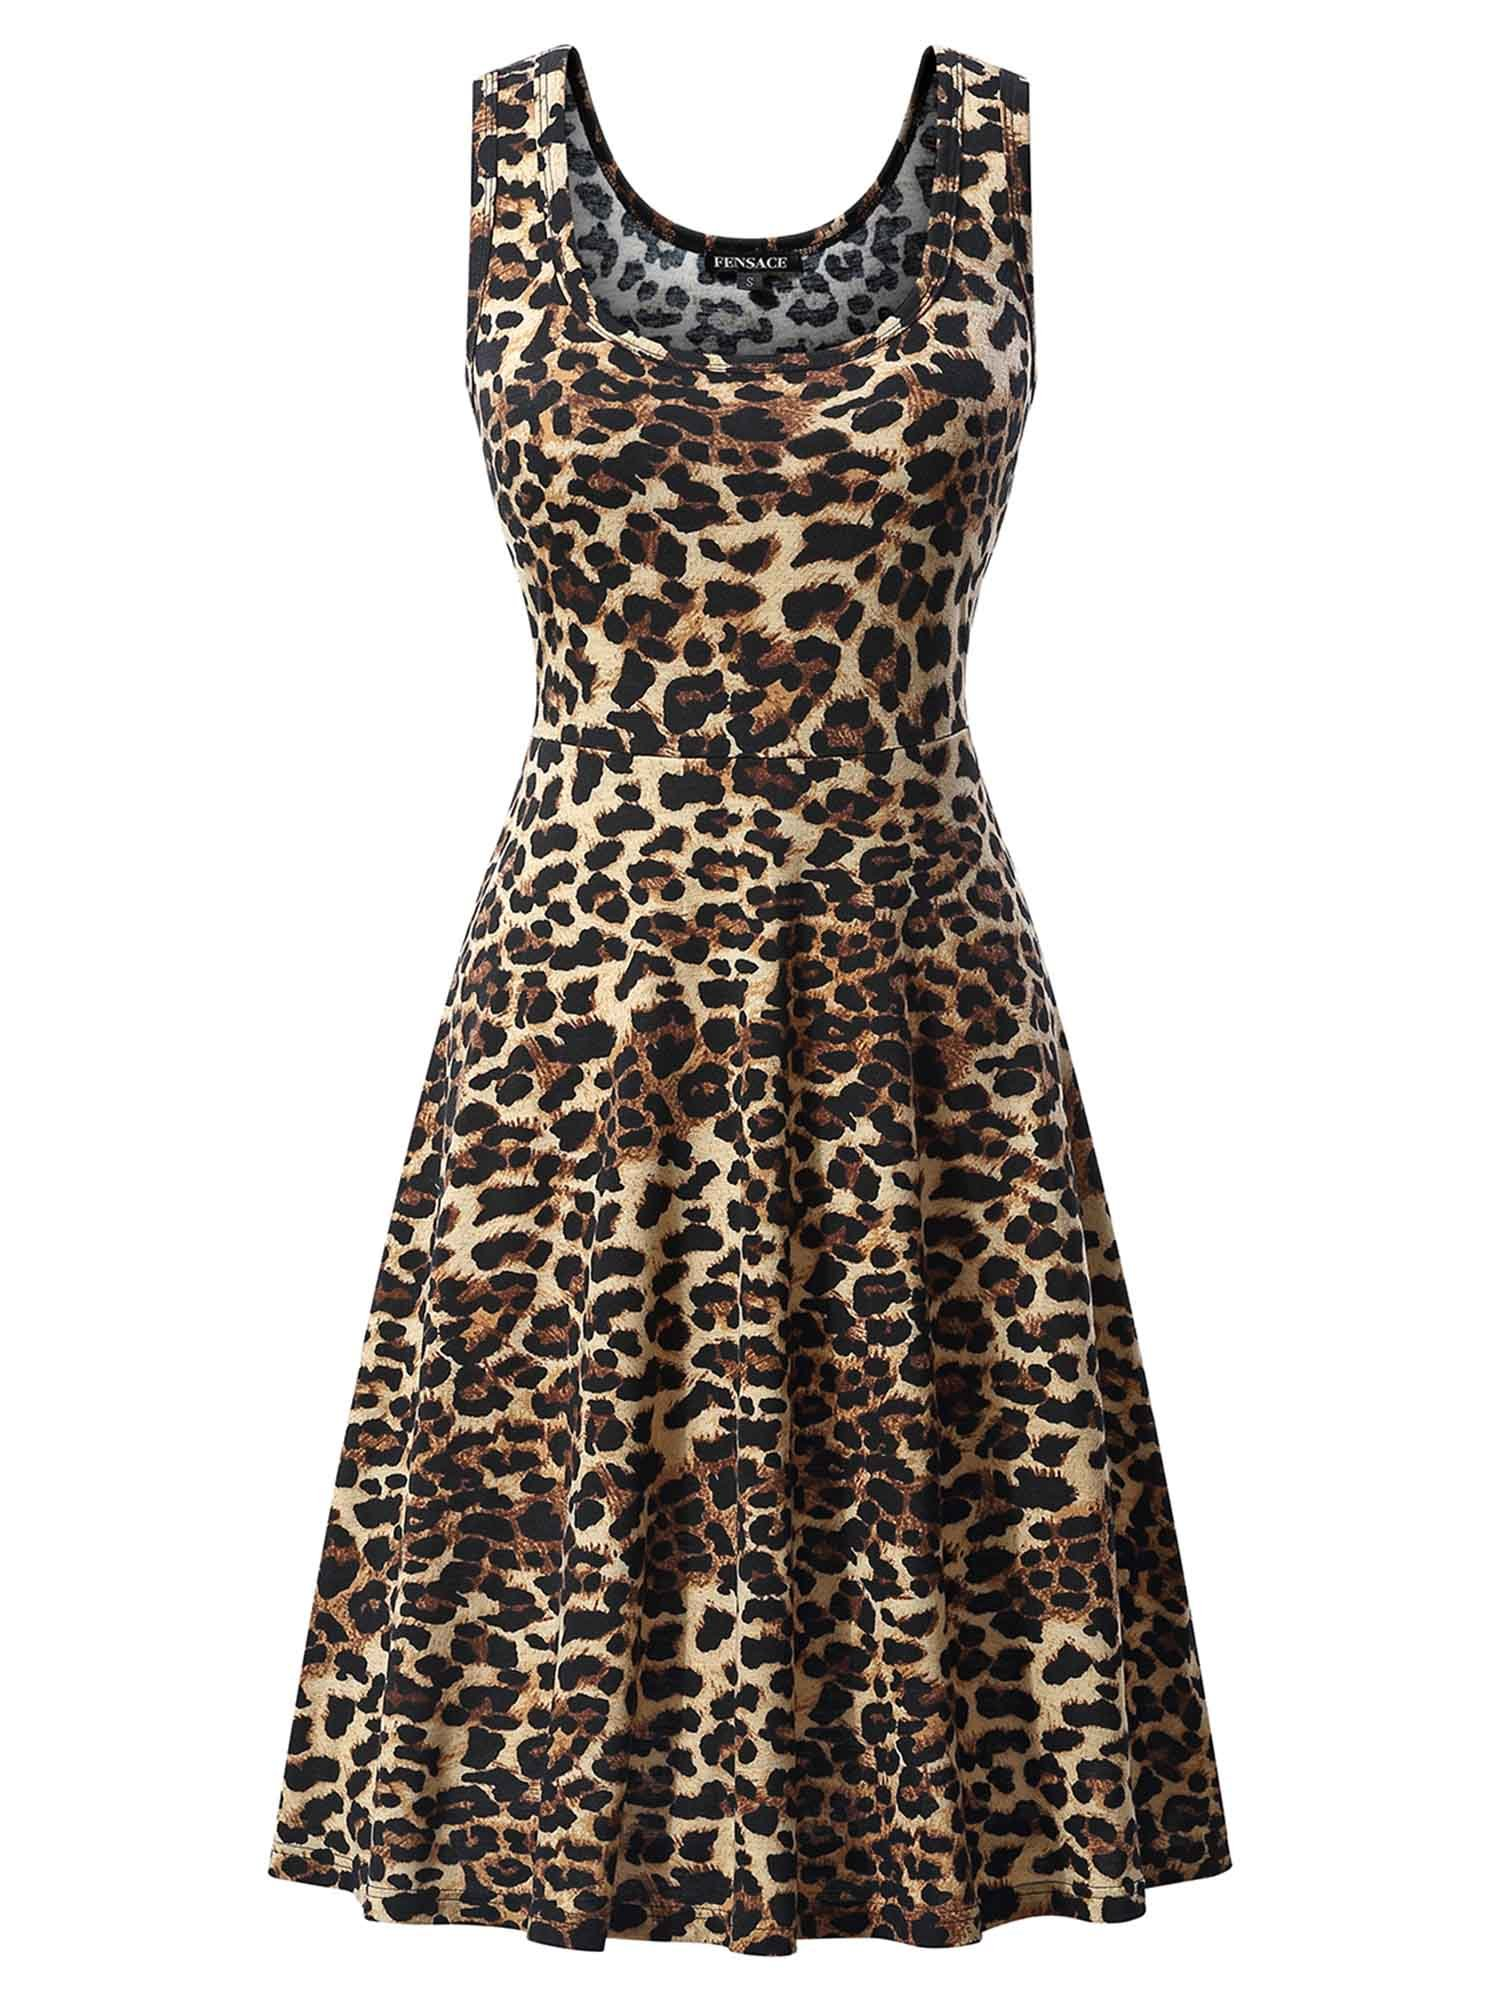 FENSACE Womens Sleeveless Floral Midi Tank Hawaiian Dress 1703012 Medium